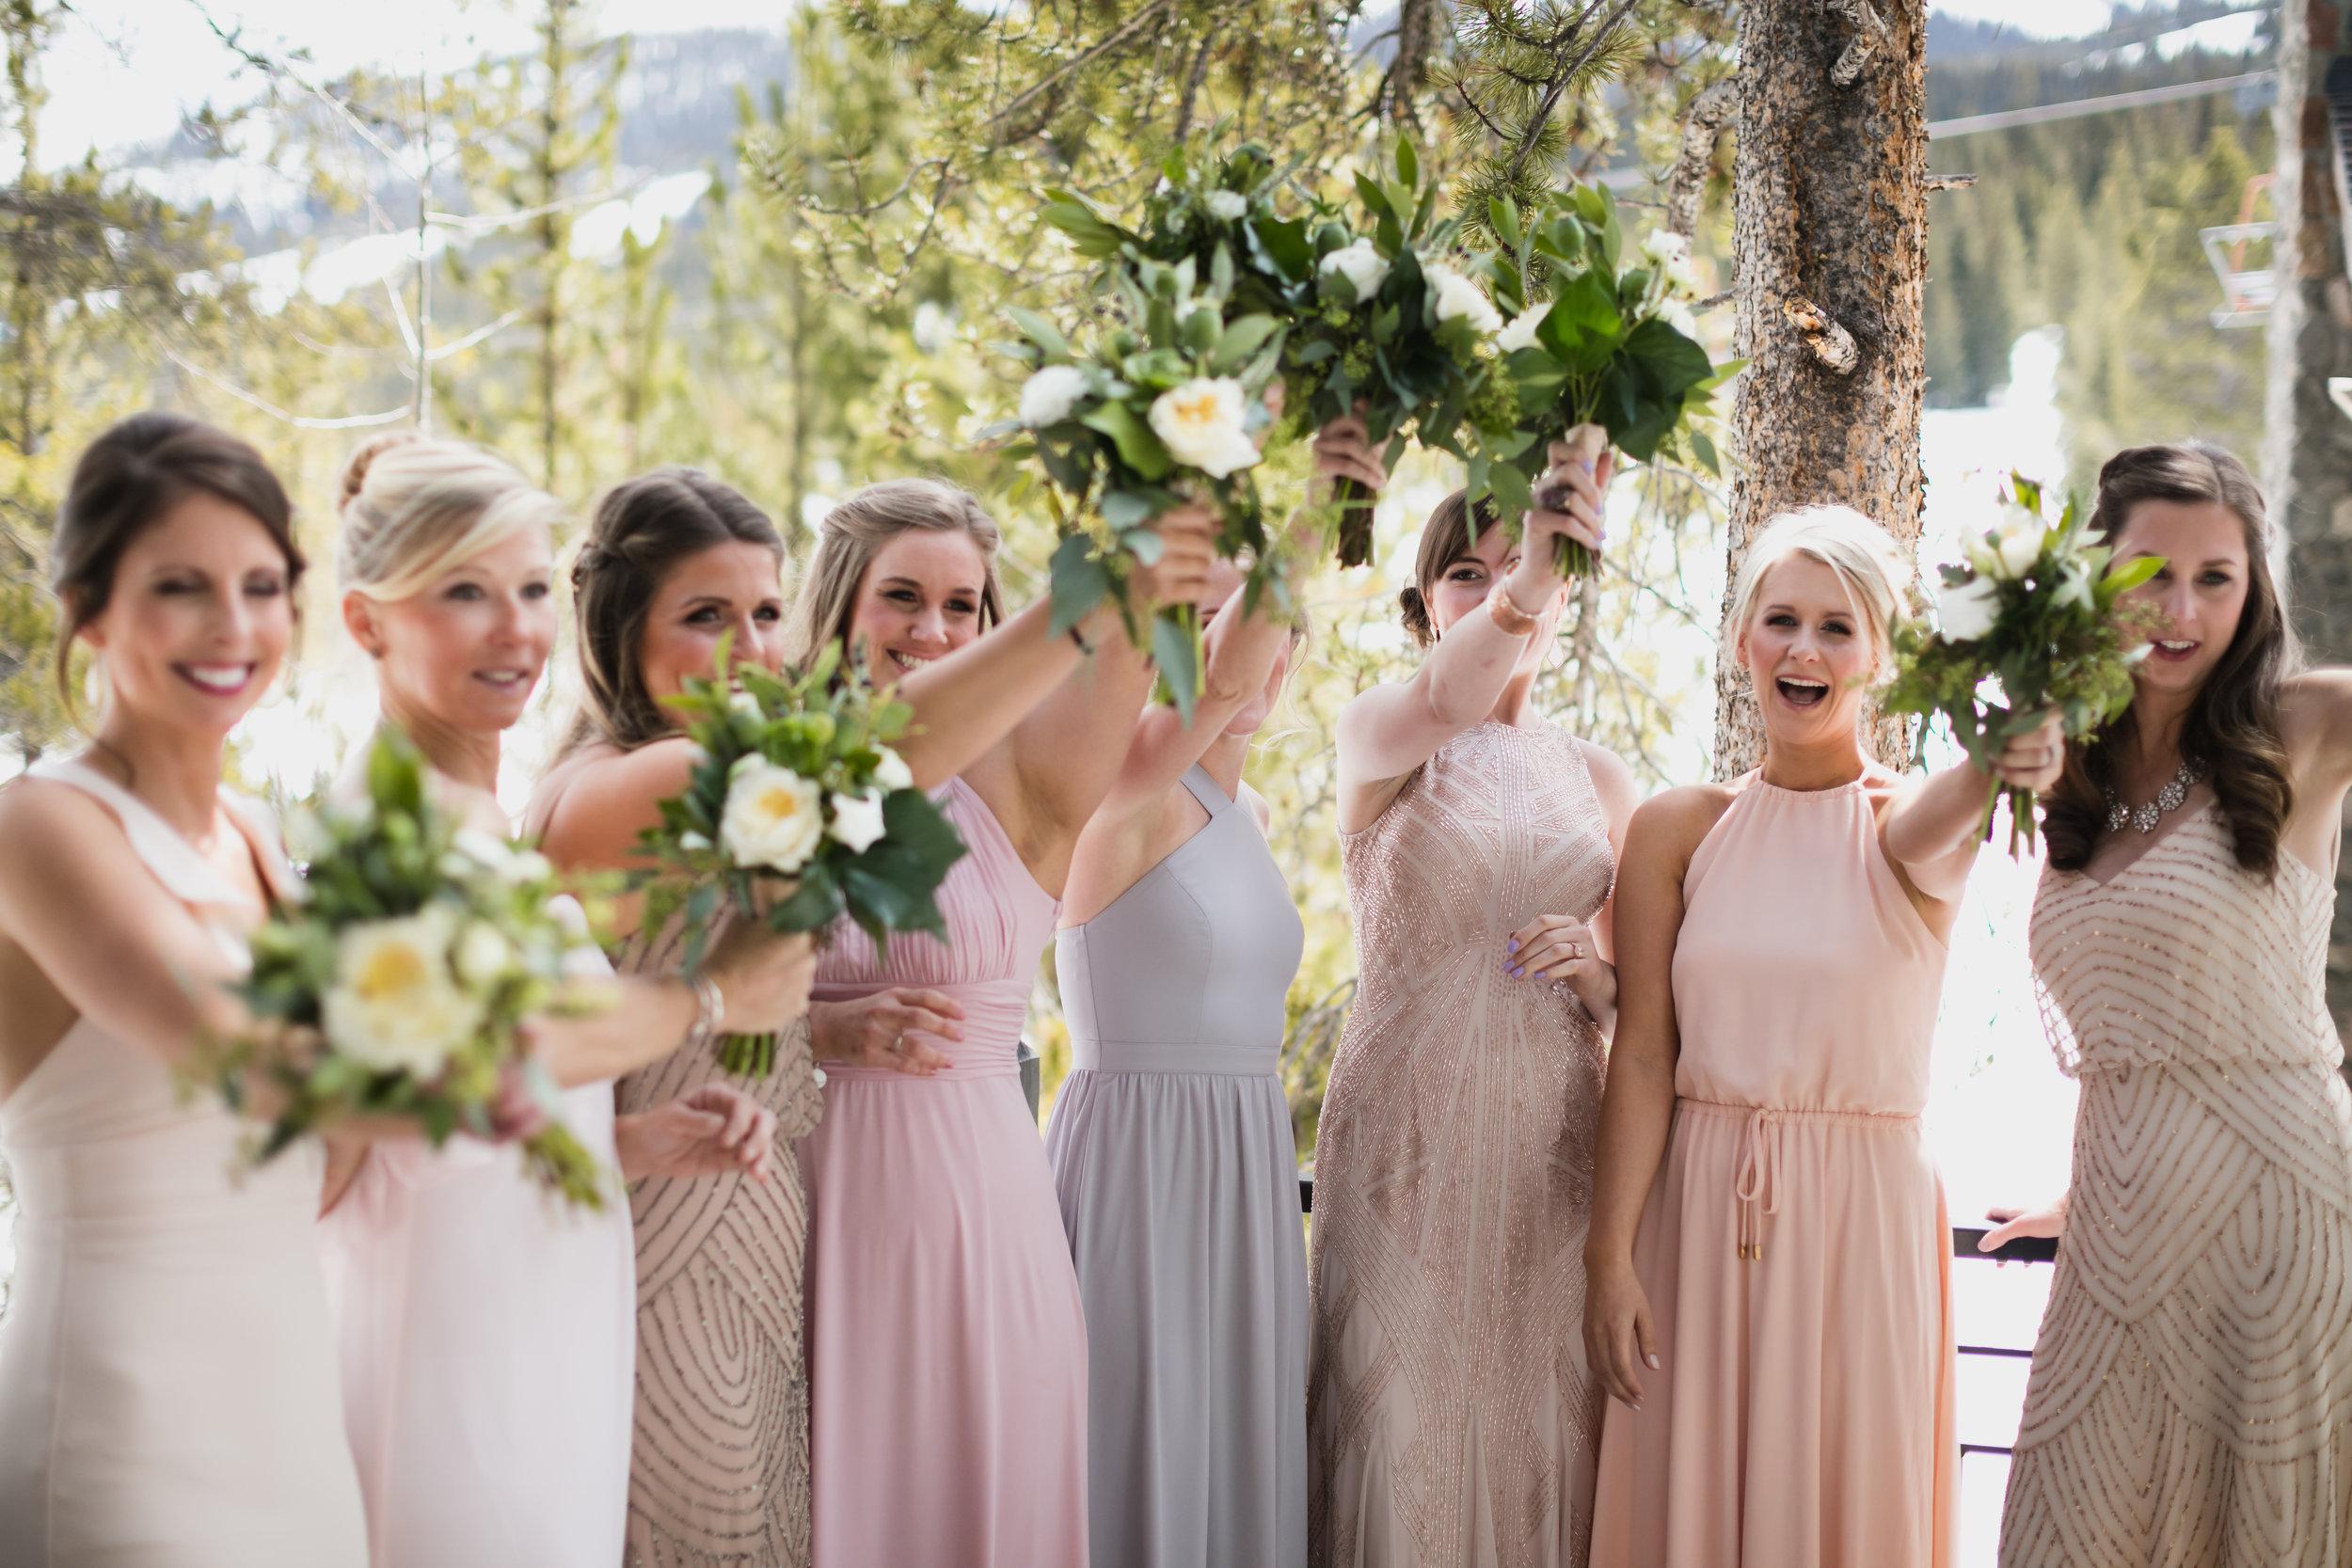 vild-photography-photographer-colorado-intimate-wedding-adventure-Stephanie- Adam-159.jpg